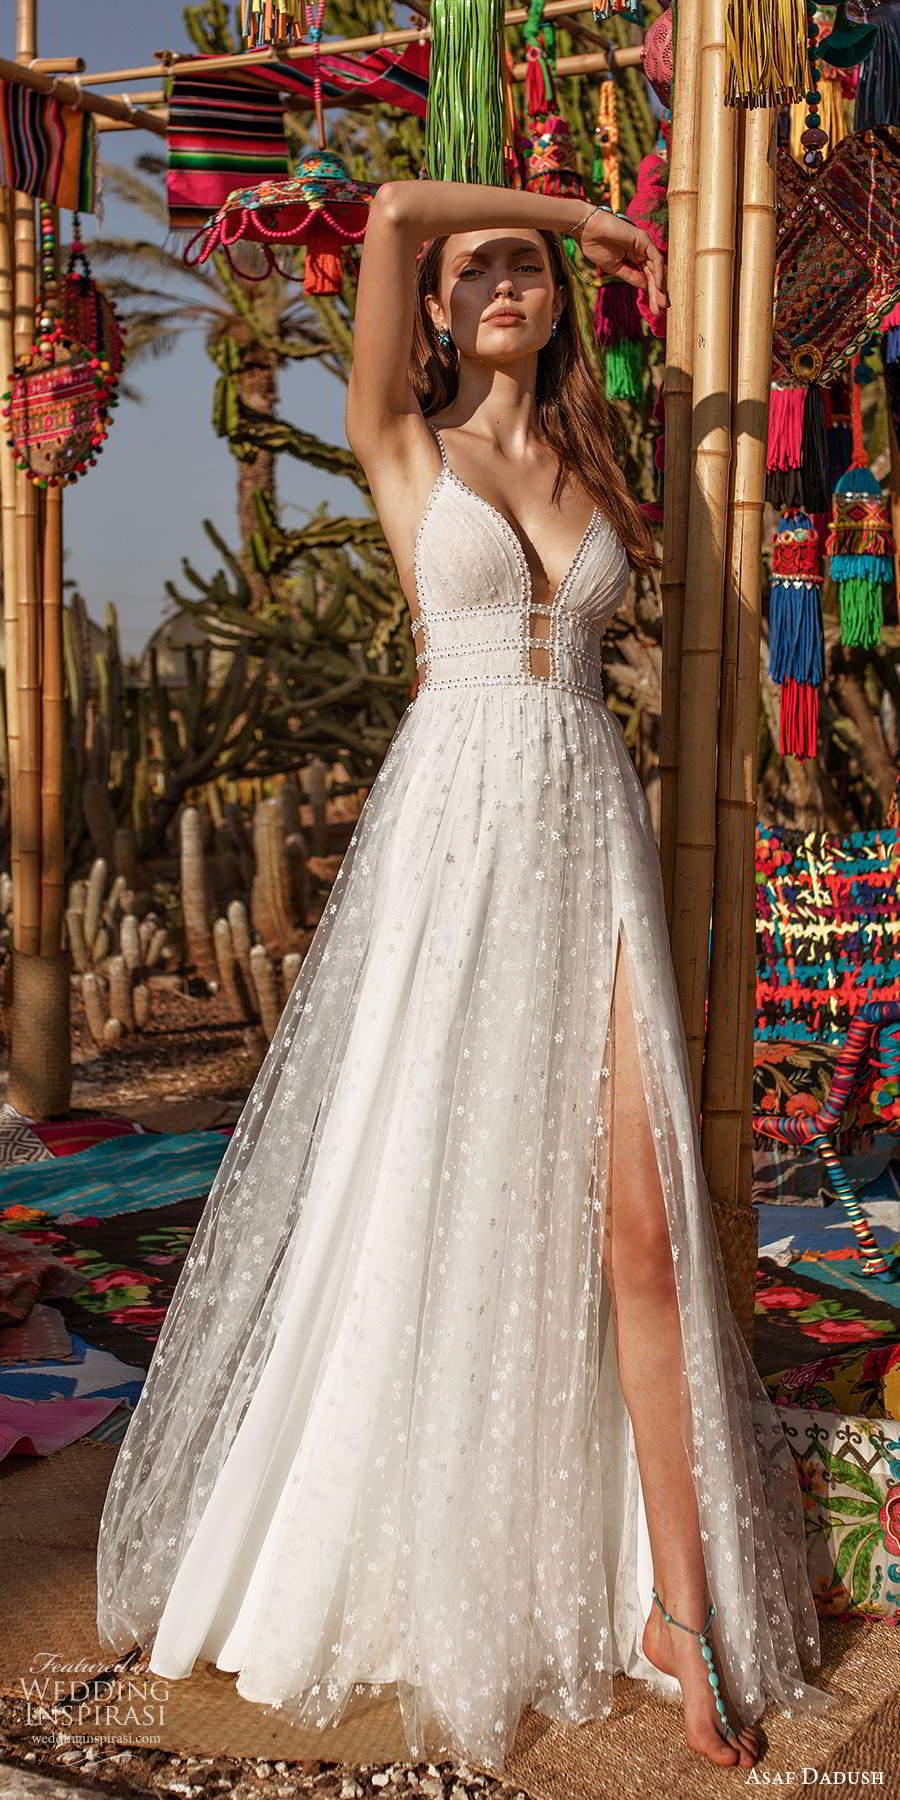 asaf dadush 2020 bridal sleeveless thin beaded straps plunging v neckline fully embellished a line ball gown wedding dress slit skirt open back (7) mv